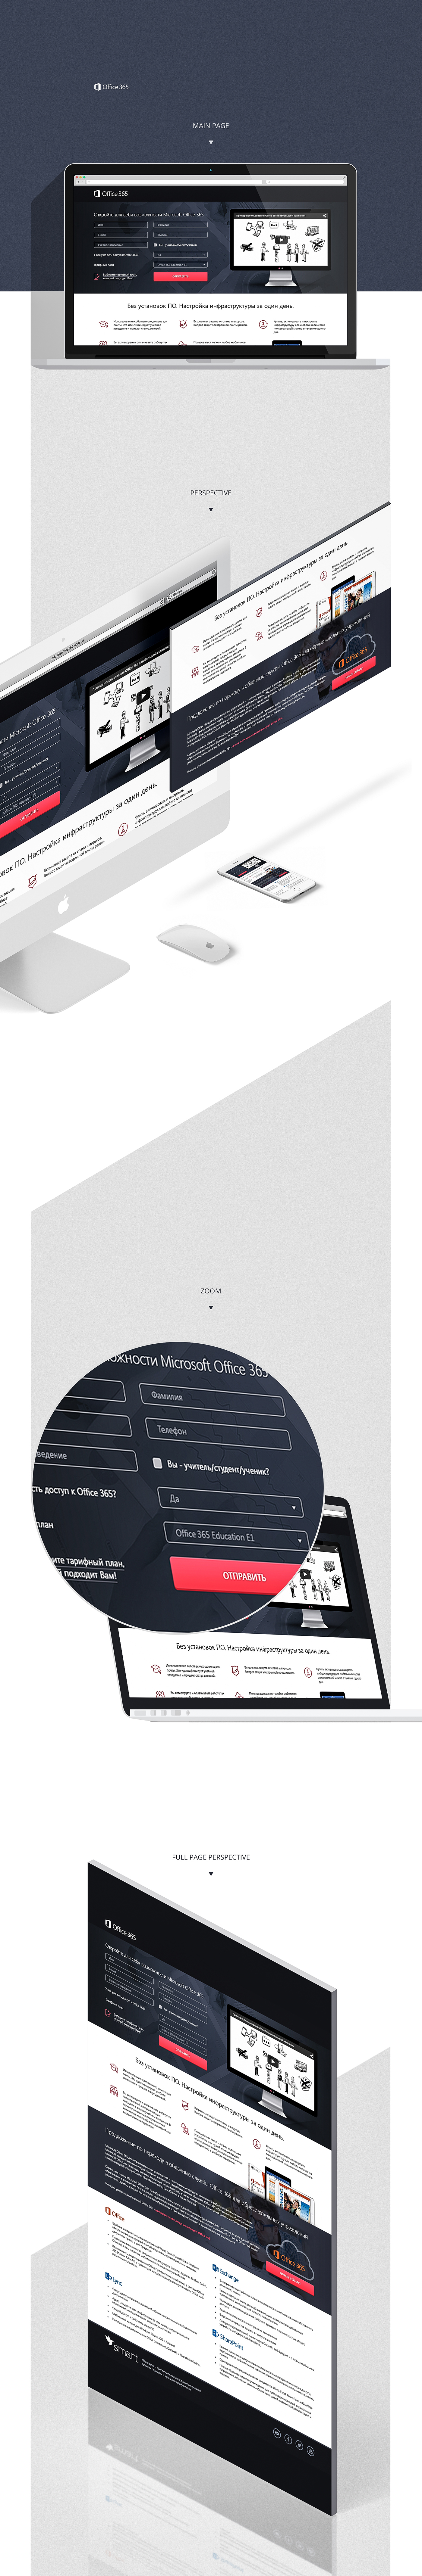 office 365 Website Web Design